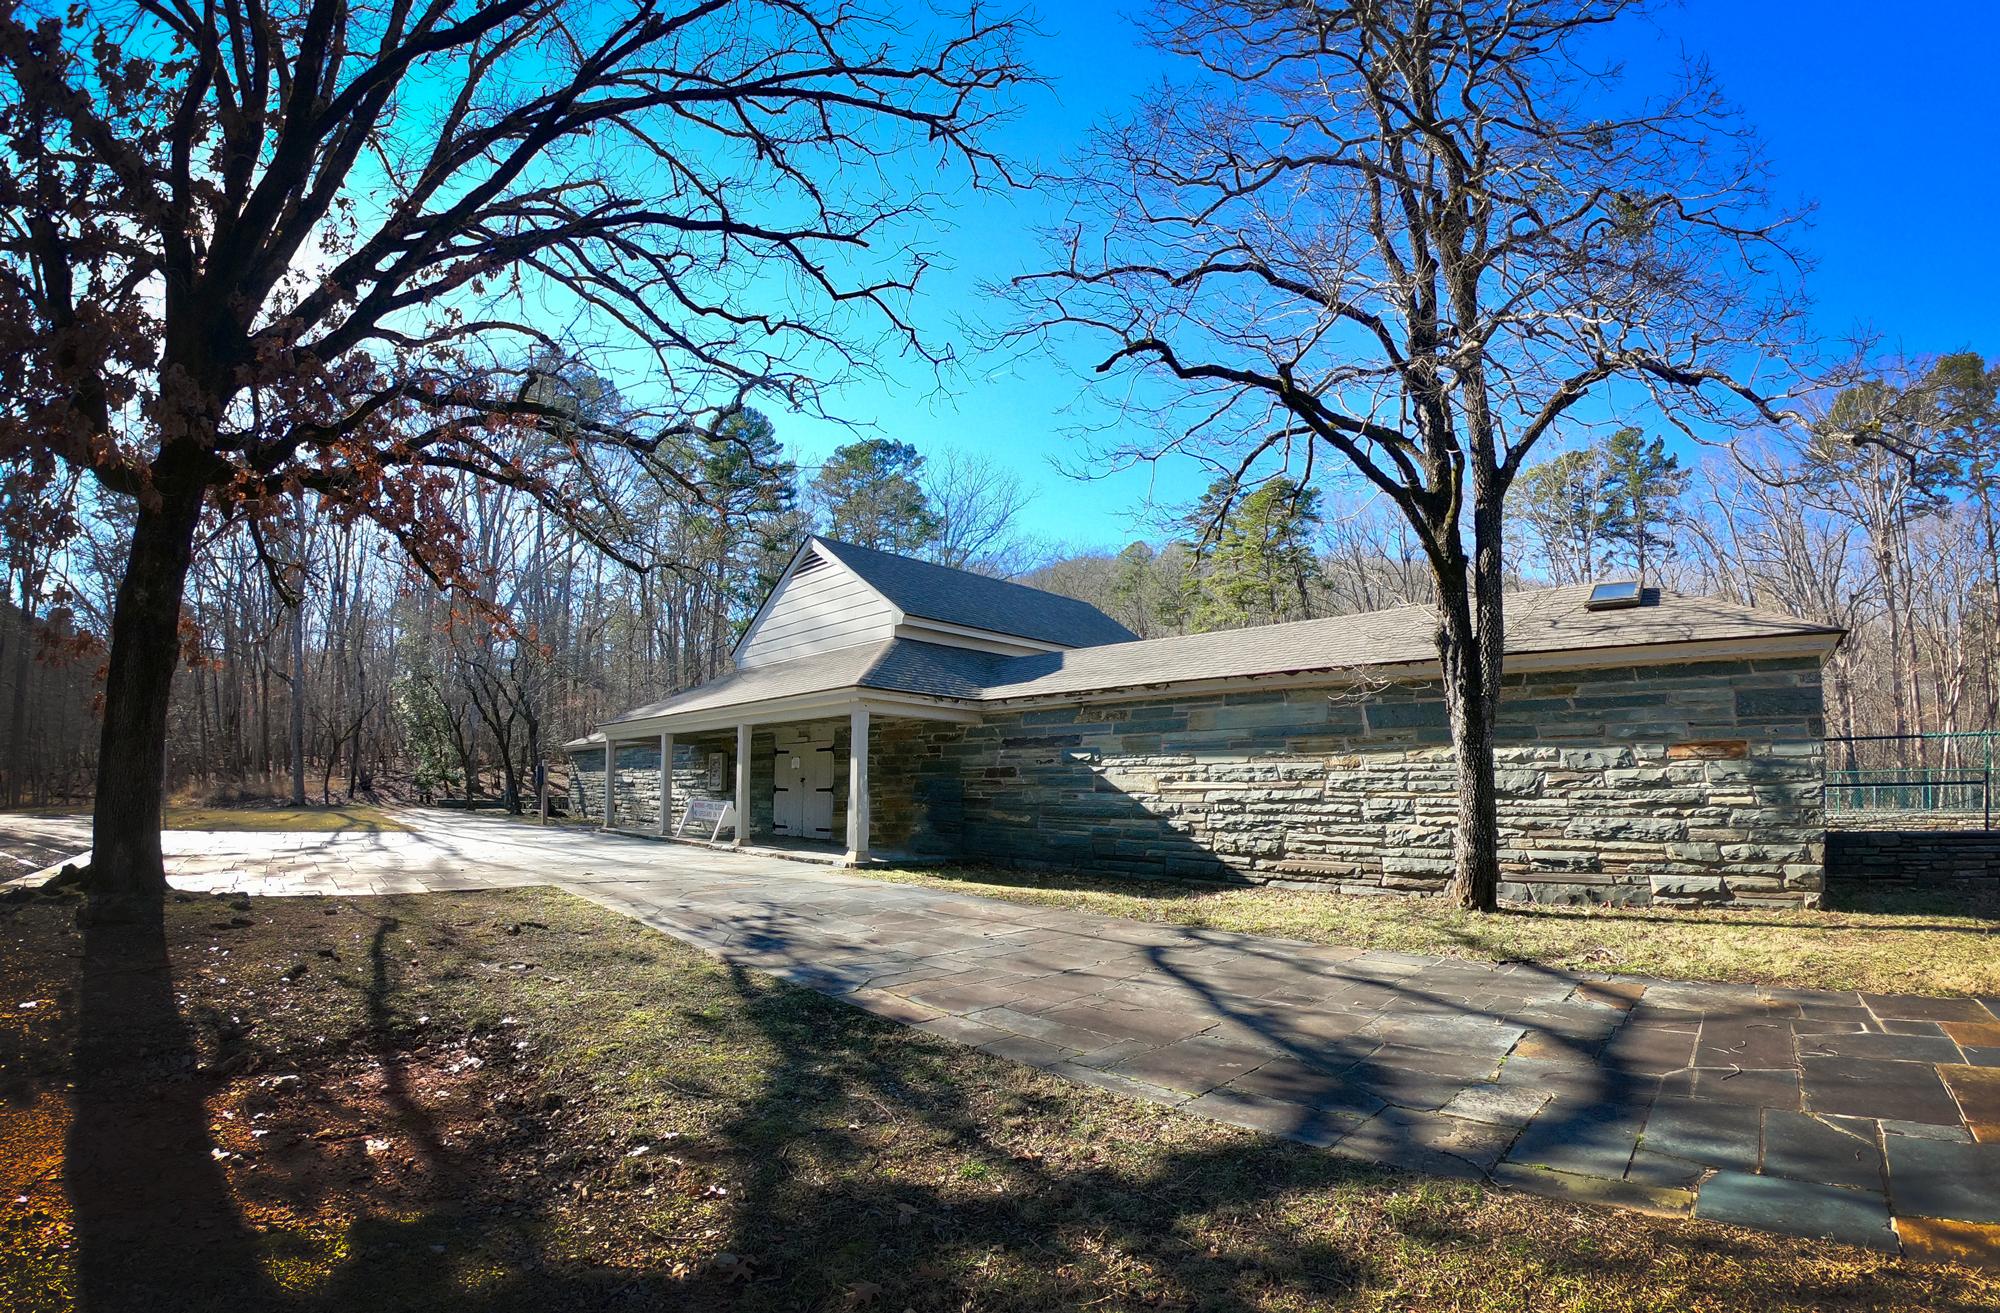 Stone swimming pool area  in Morrow Mountain State Park, North Carolina